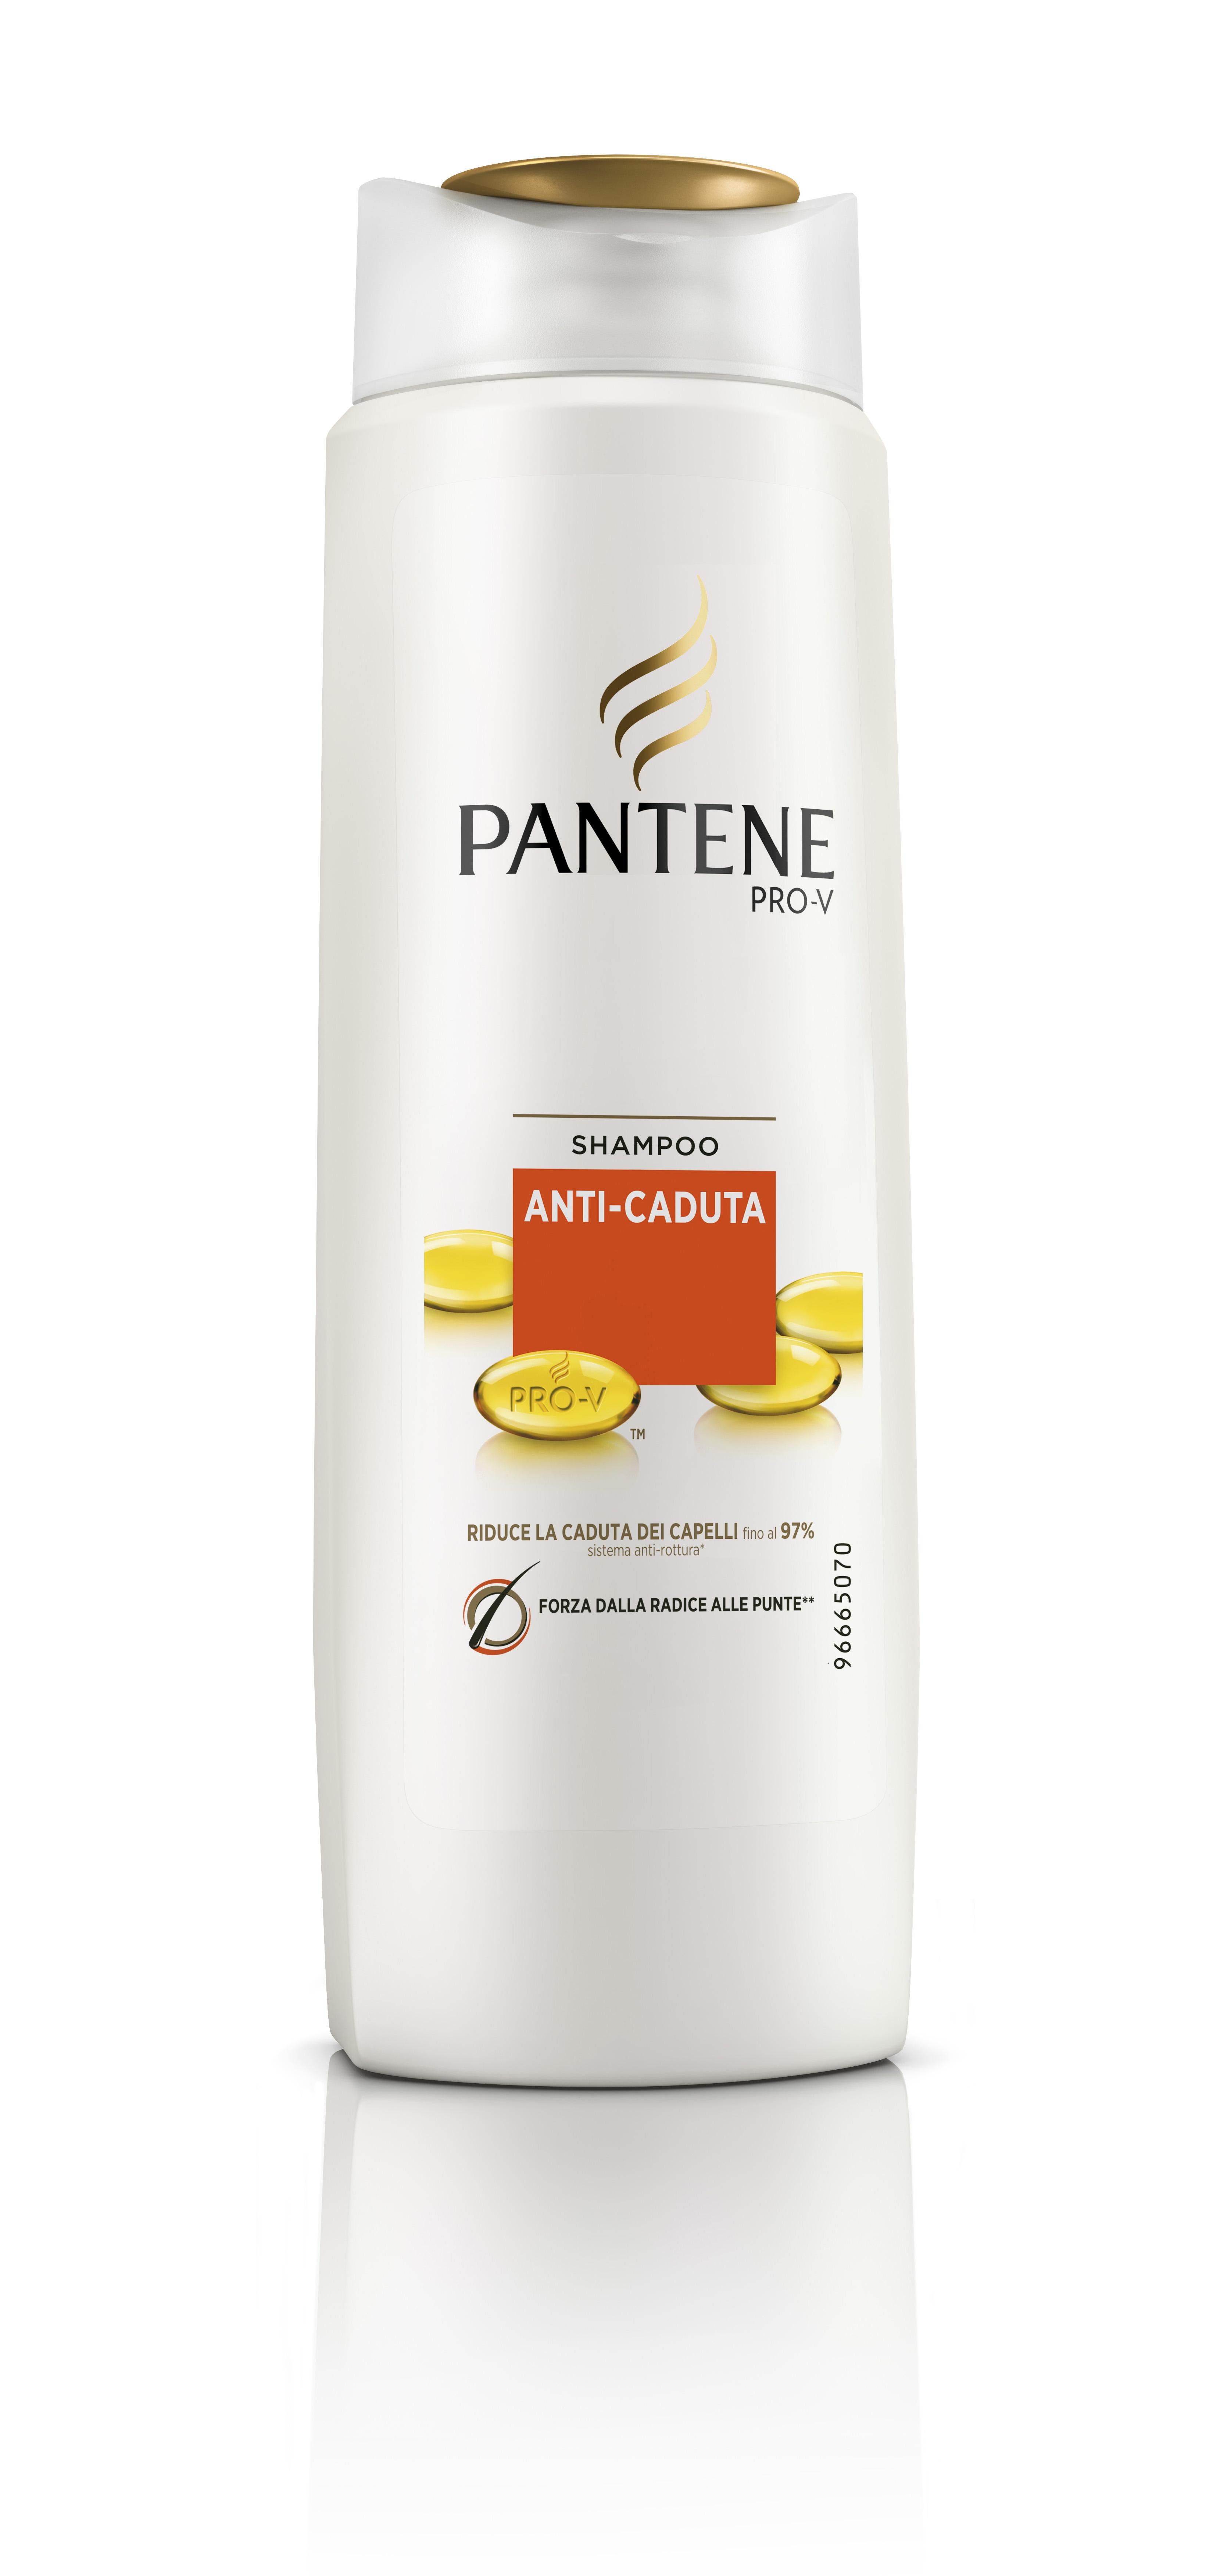 Image of Pantene Shampoo Anti-Caduta 675 ml 4084500186866